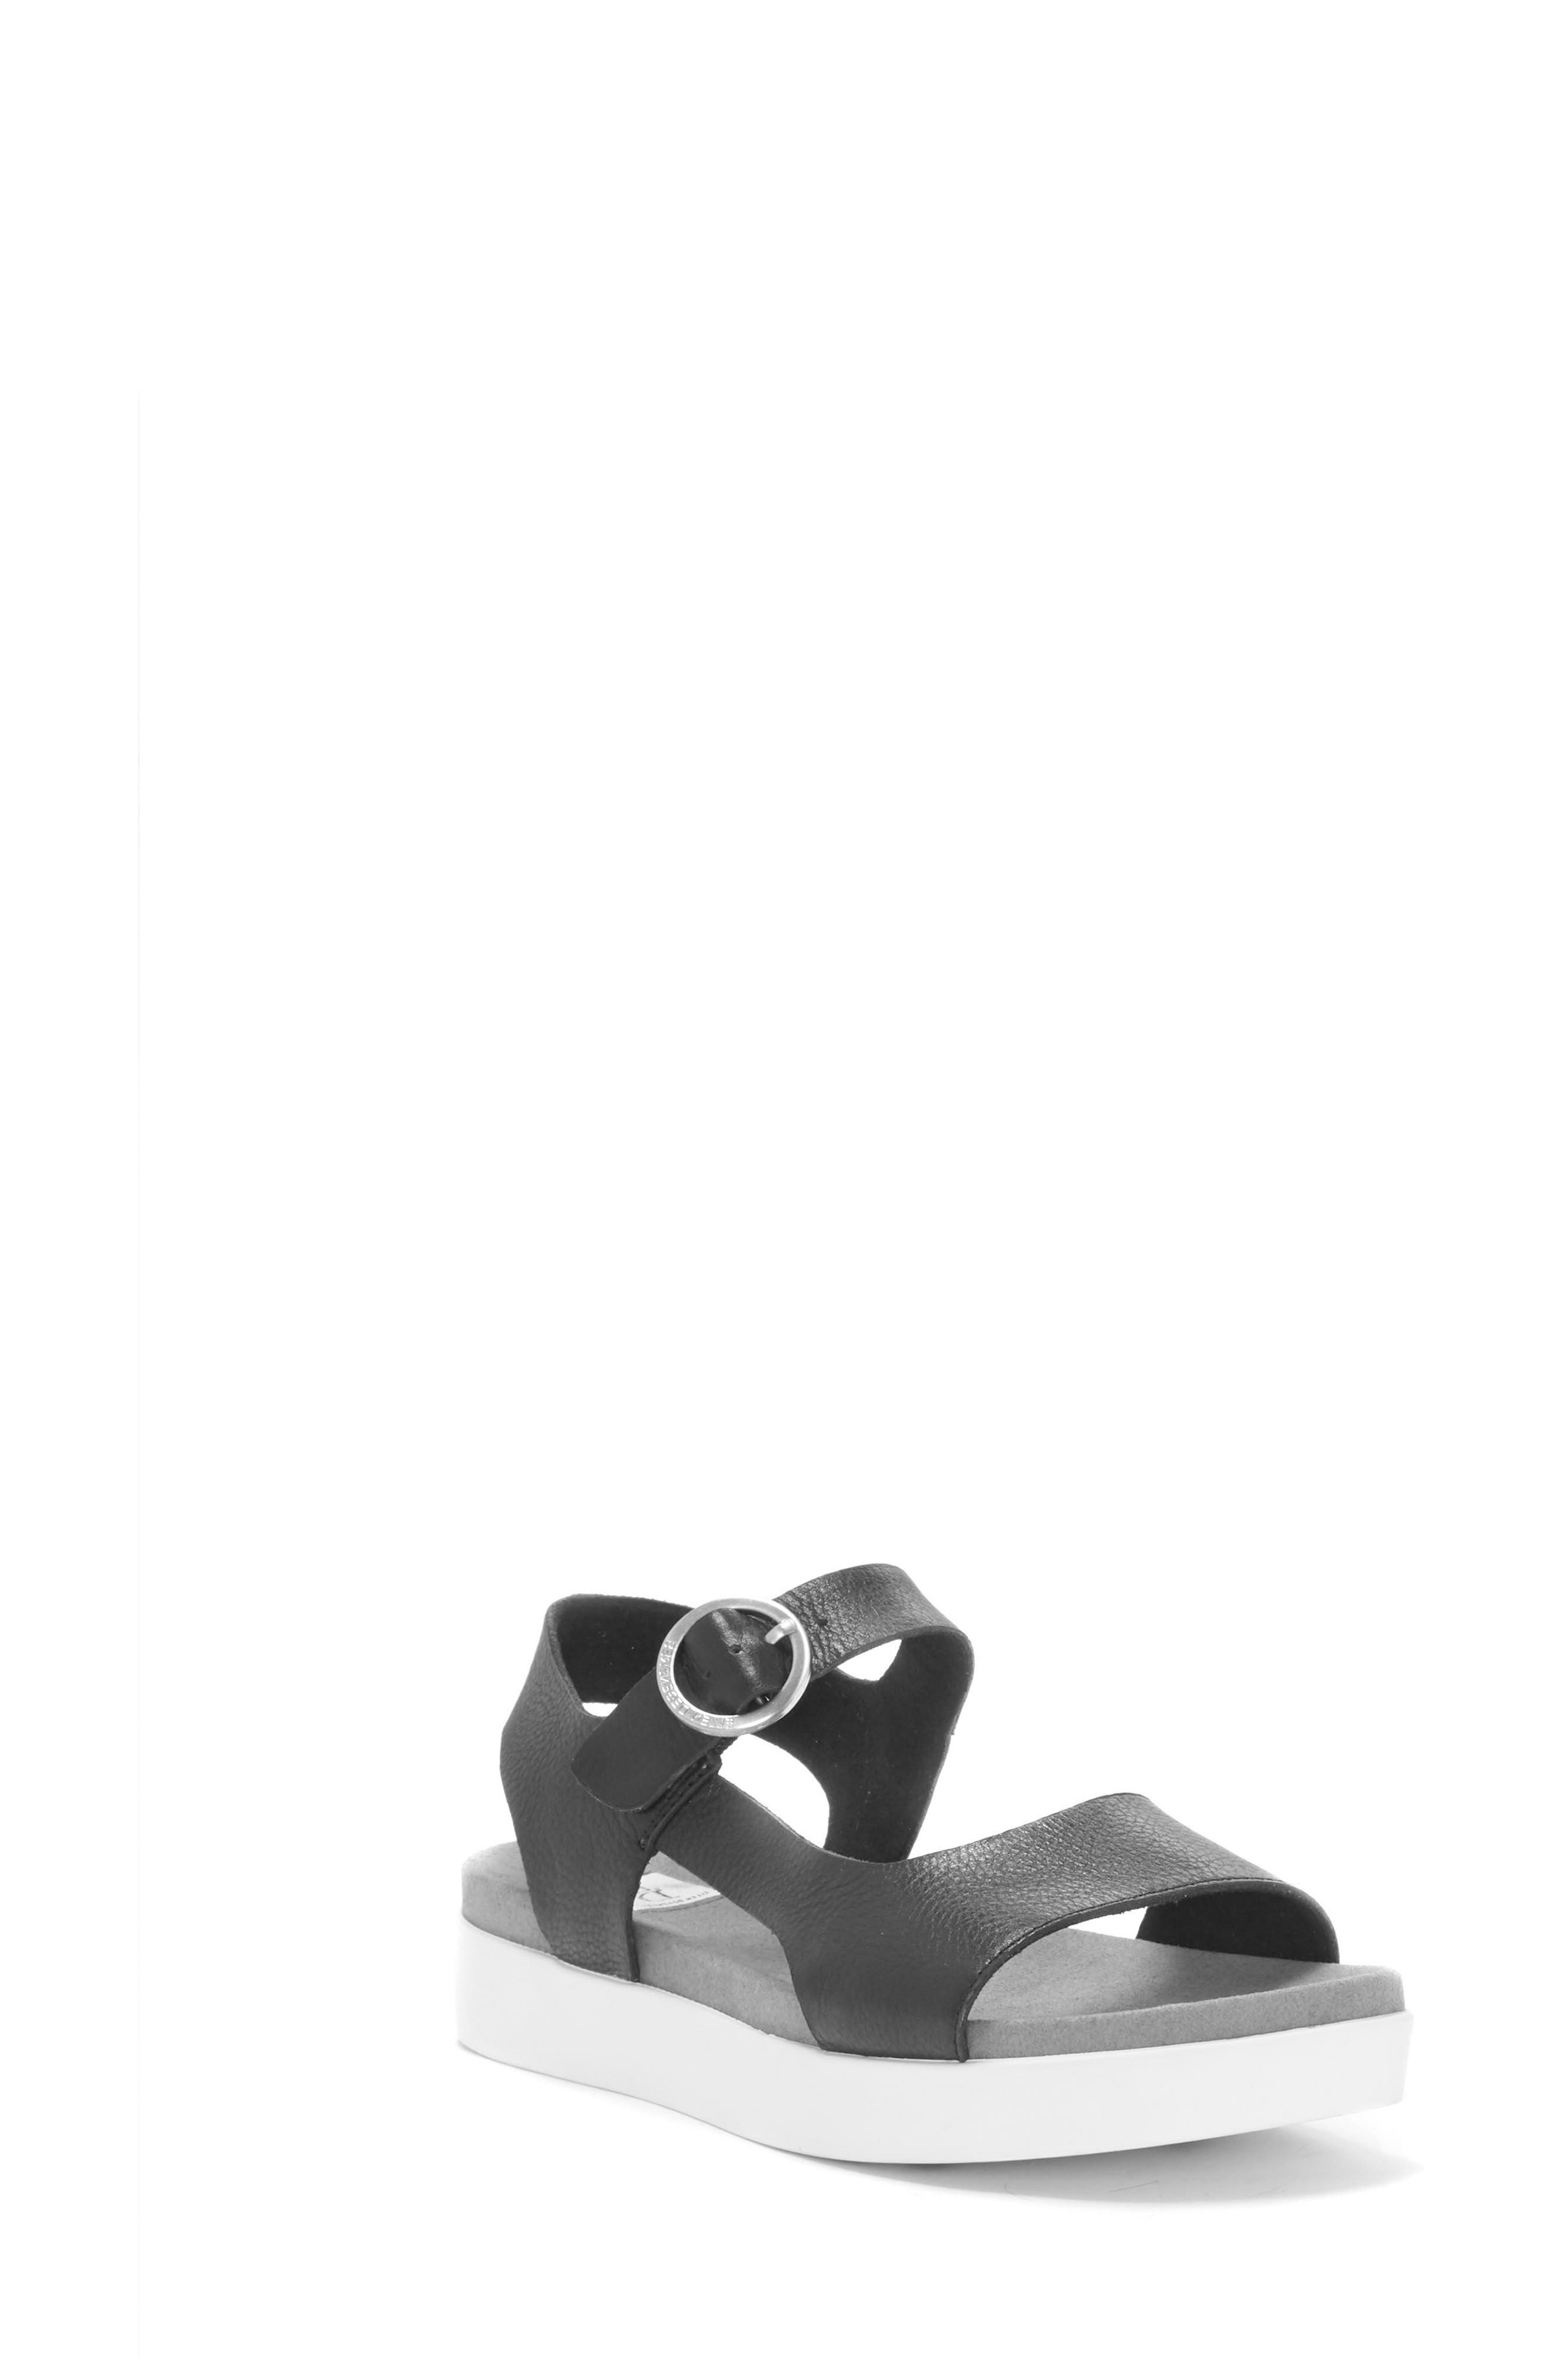 Caspin Sandal,                         Main,                         color, Black Leather